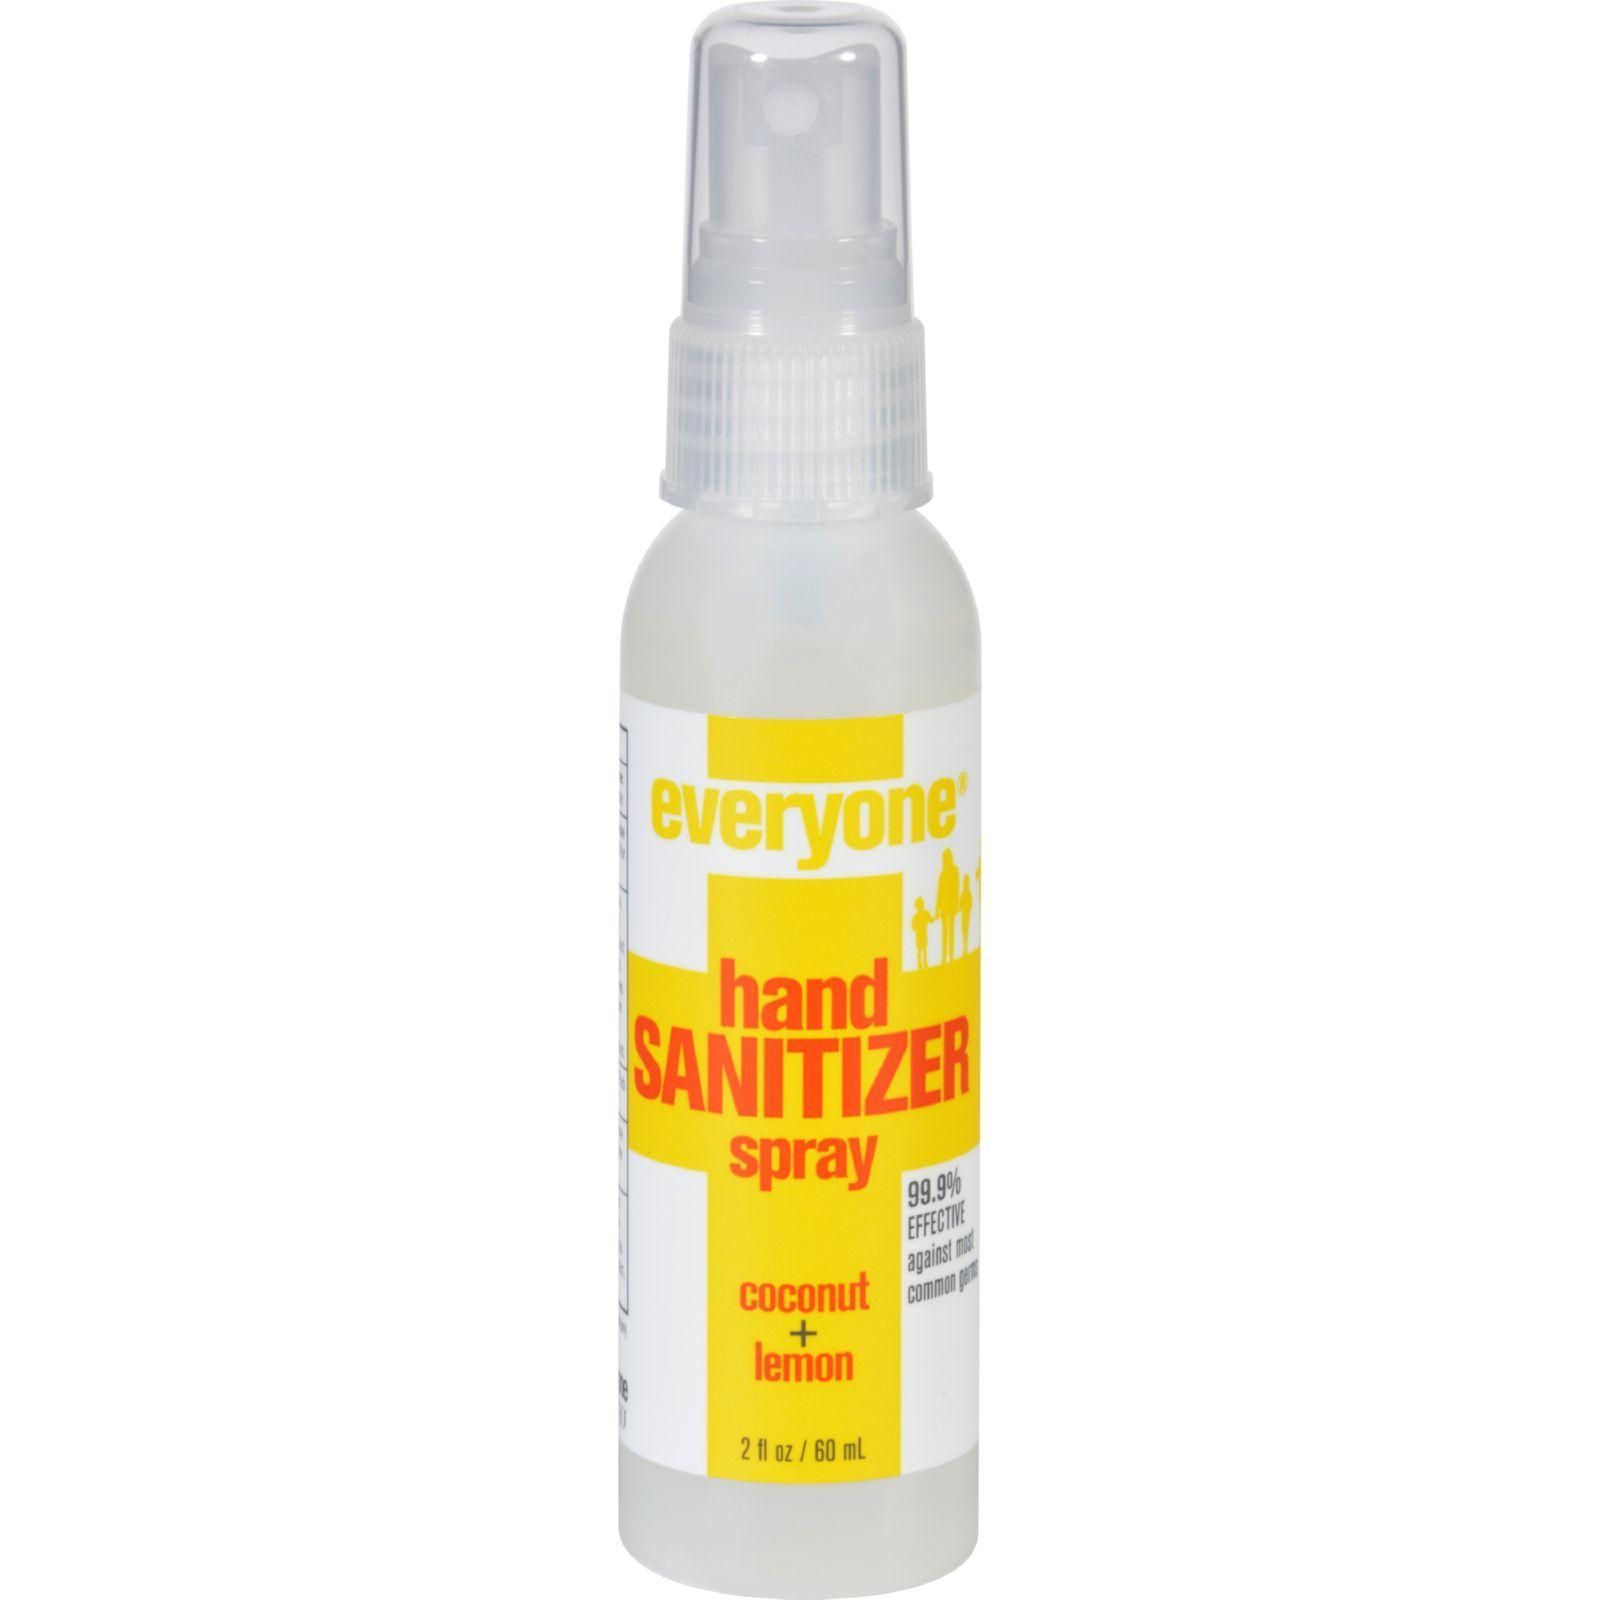 Everyone Hand Sanitizer Spray Lavender Aloe Hand Sanitizer